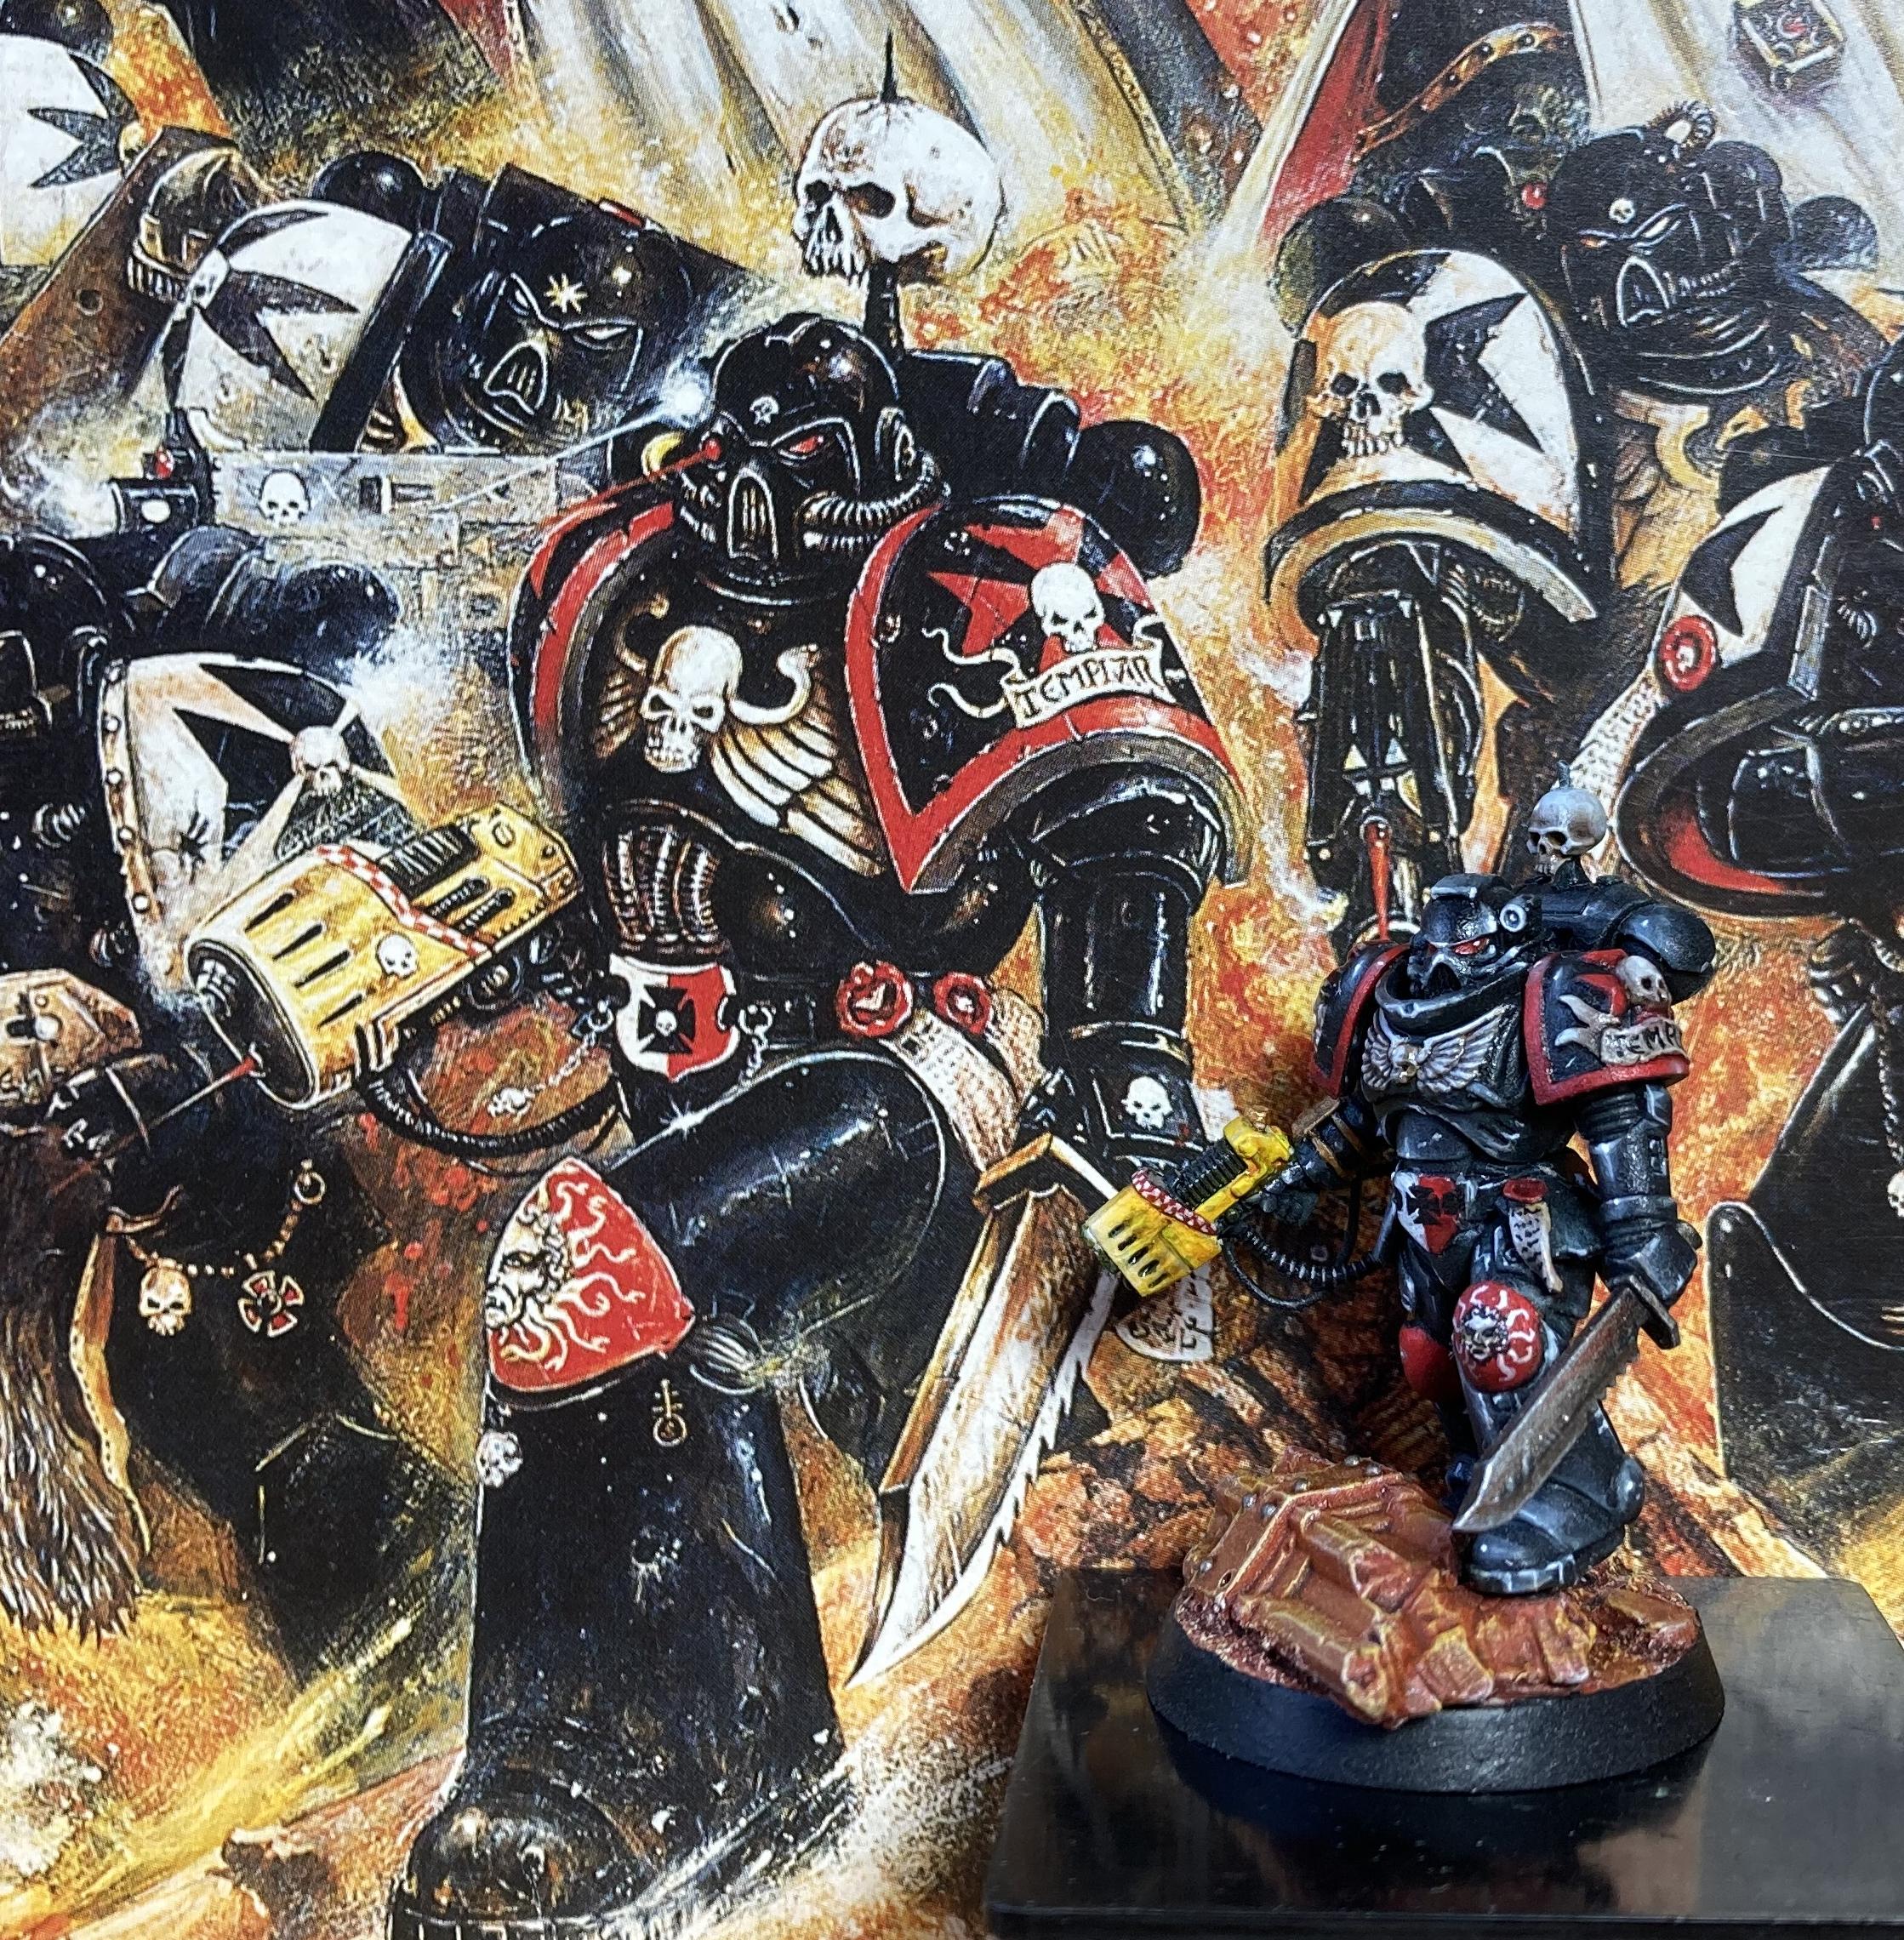 Veteran Sergeant compared to artwork